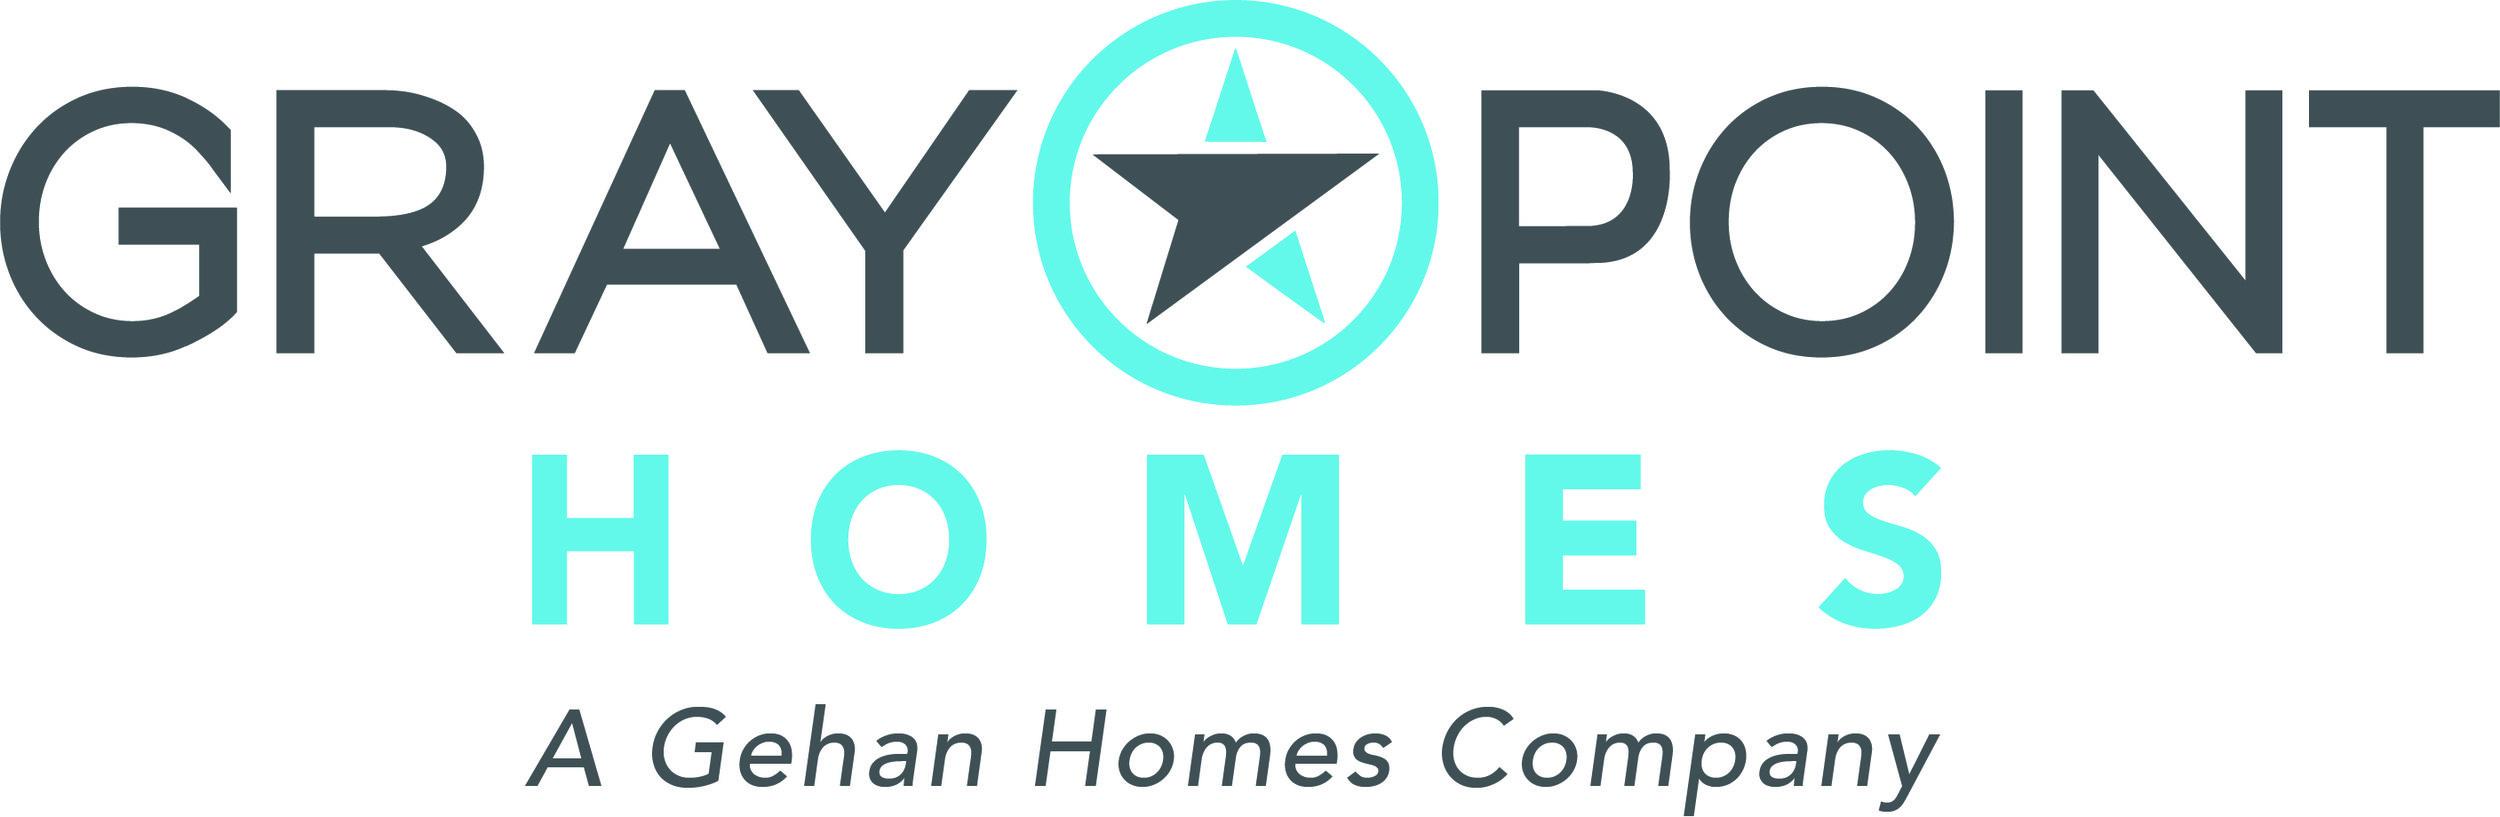 GPH_A Gehan Homes Company_WHITE.jpg